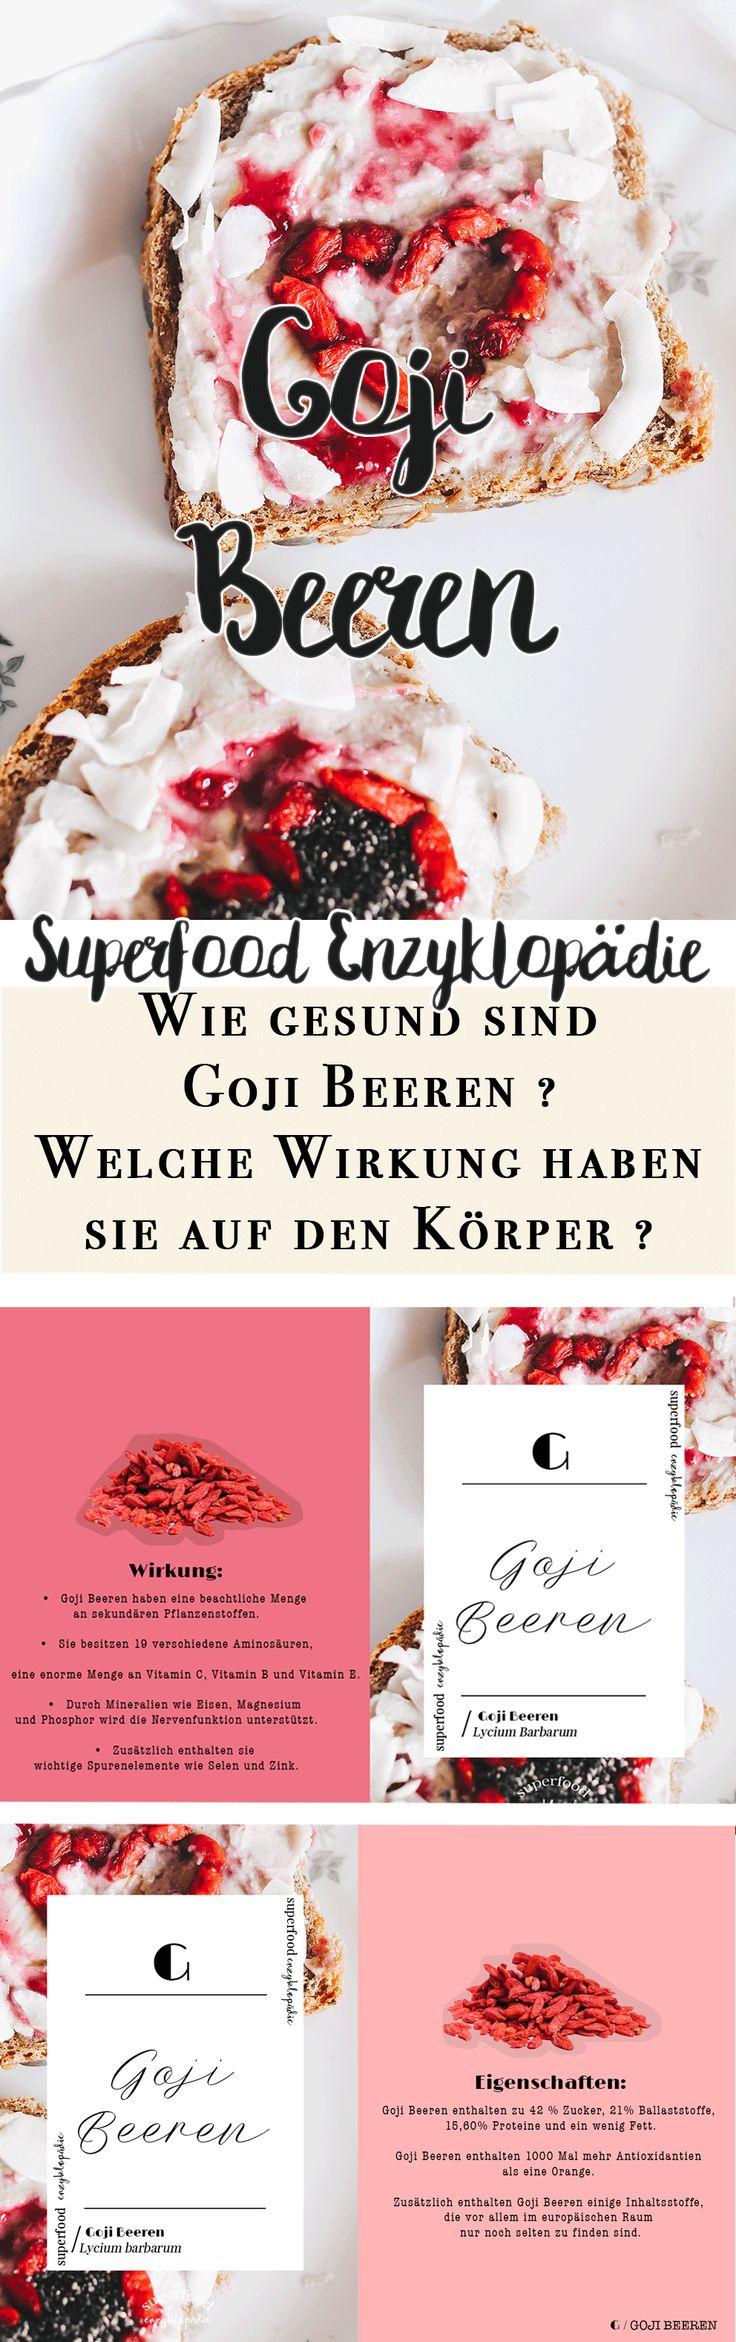 Vanillaholica | Superfood Enzyklopädie // G wie Goji Beeren. | http://www.vanillaholica.com